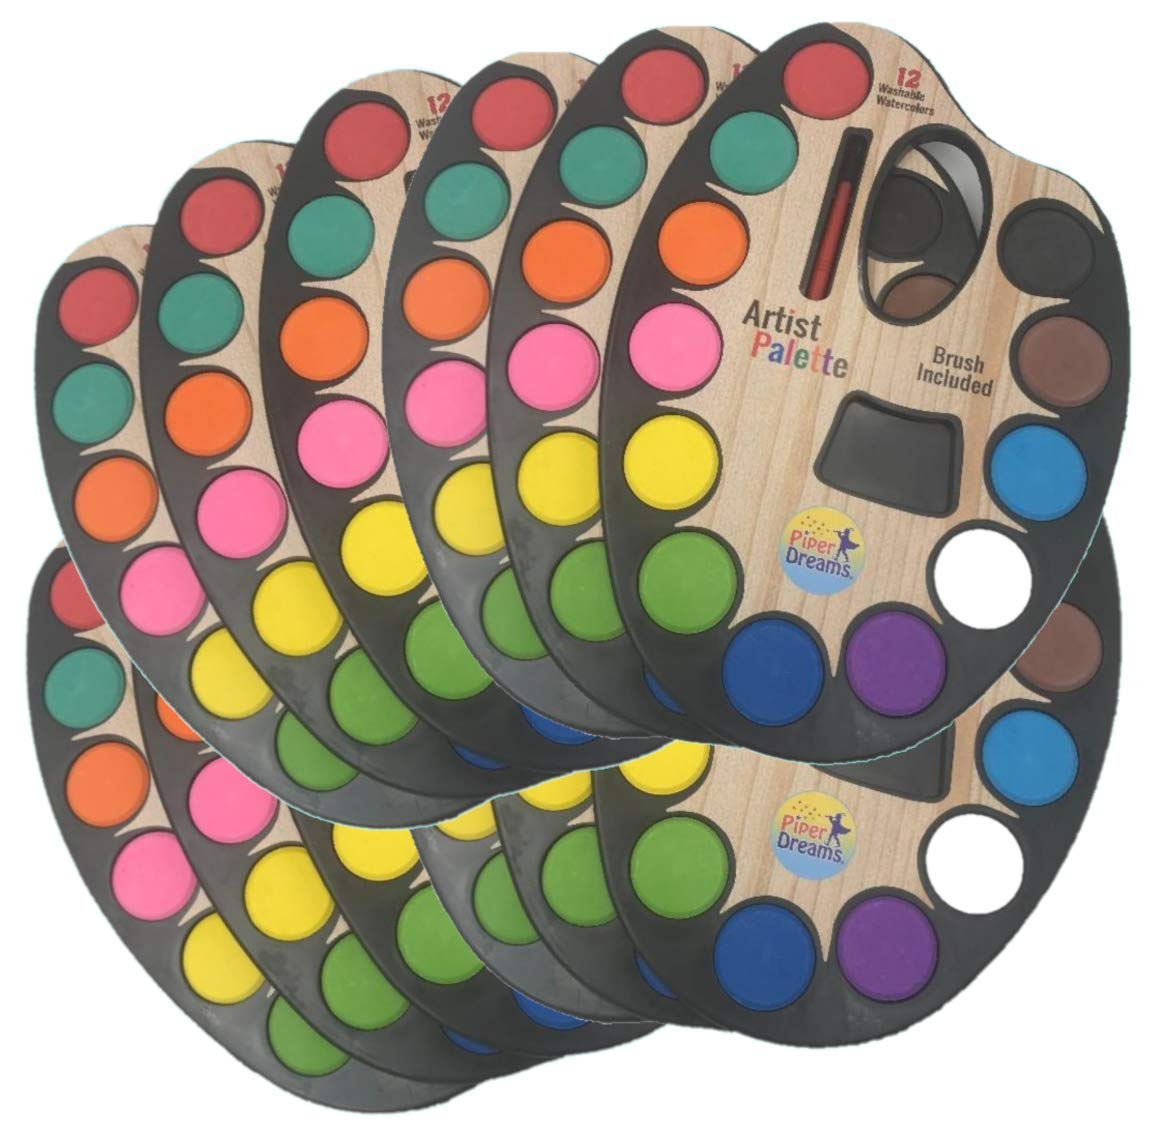 12 Pack - Watercolor Paint Set - Each Palette Contains 12 Different Vibrant Colors, a Paint Brush and a Mixing Pan built into the Palette